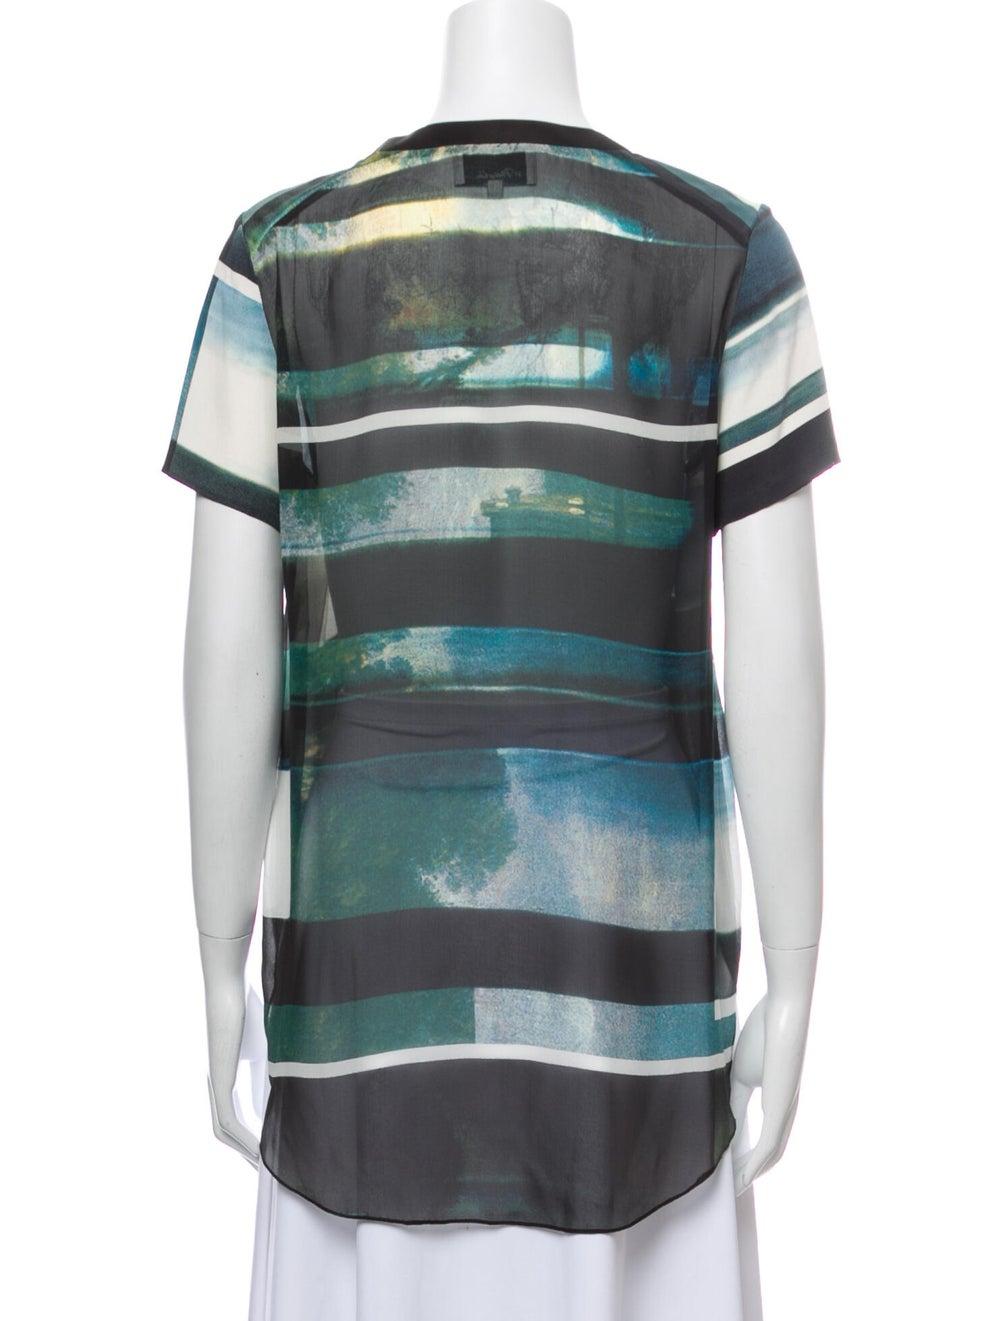 3.1 Phillip Lim Silk Striped T-Shirt Green - image 3